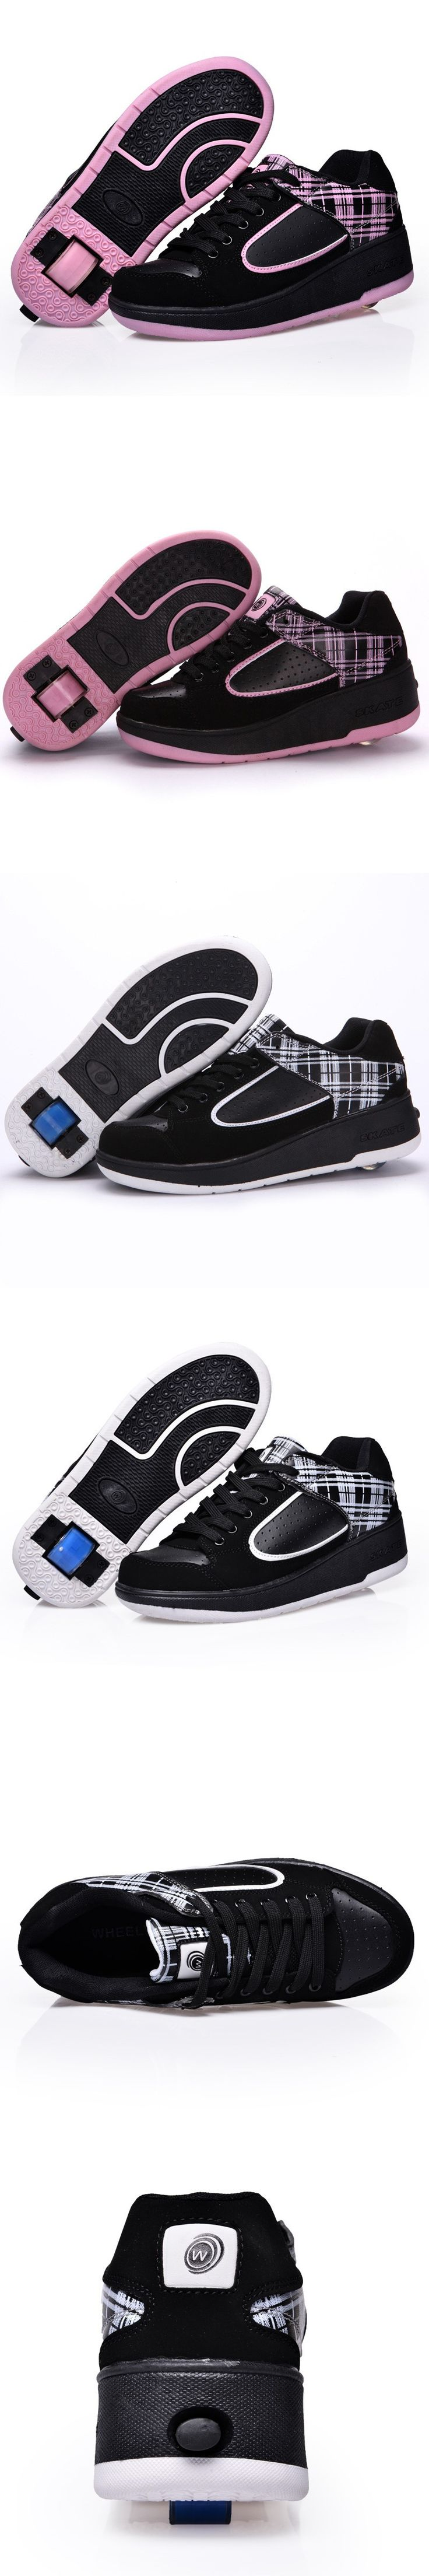 Child heelys Jazzy Junior girls boys heelys roller skate shoes for children kids sneakers with wheels EU size 29-37